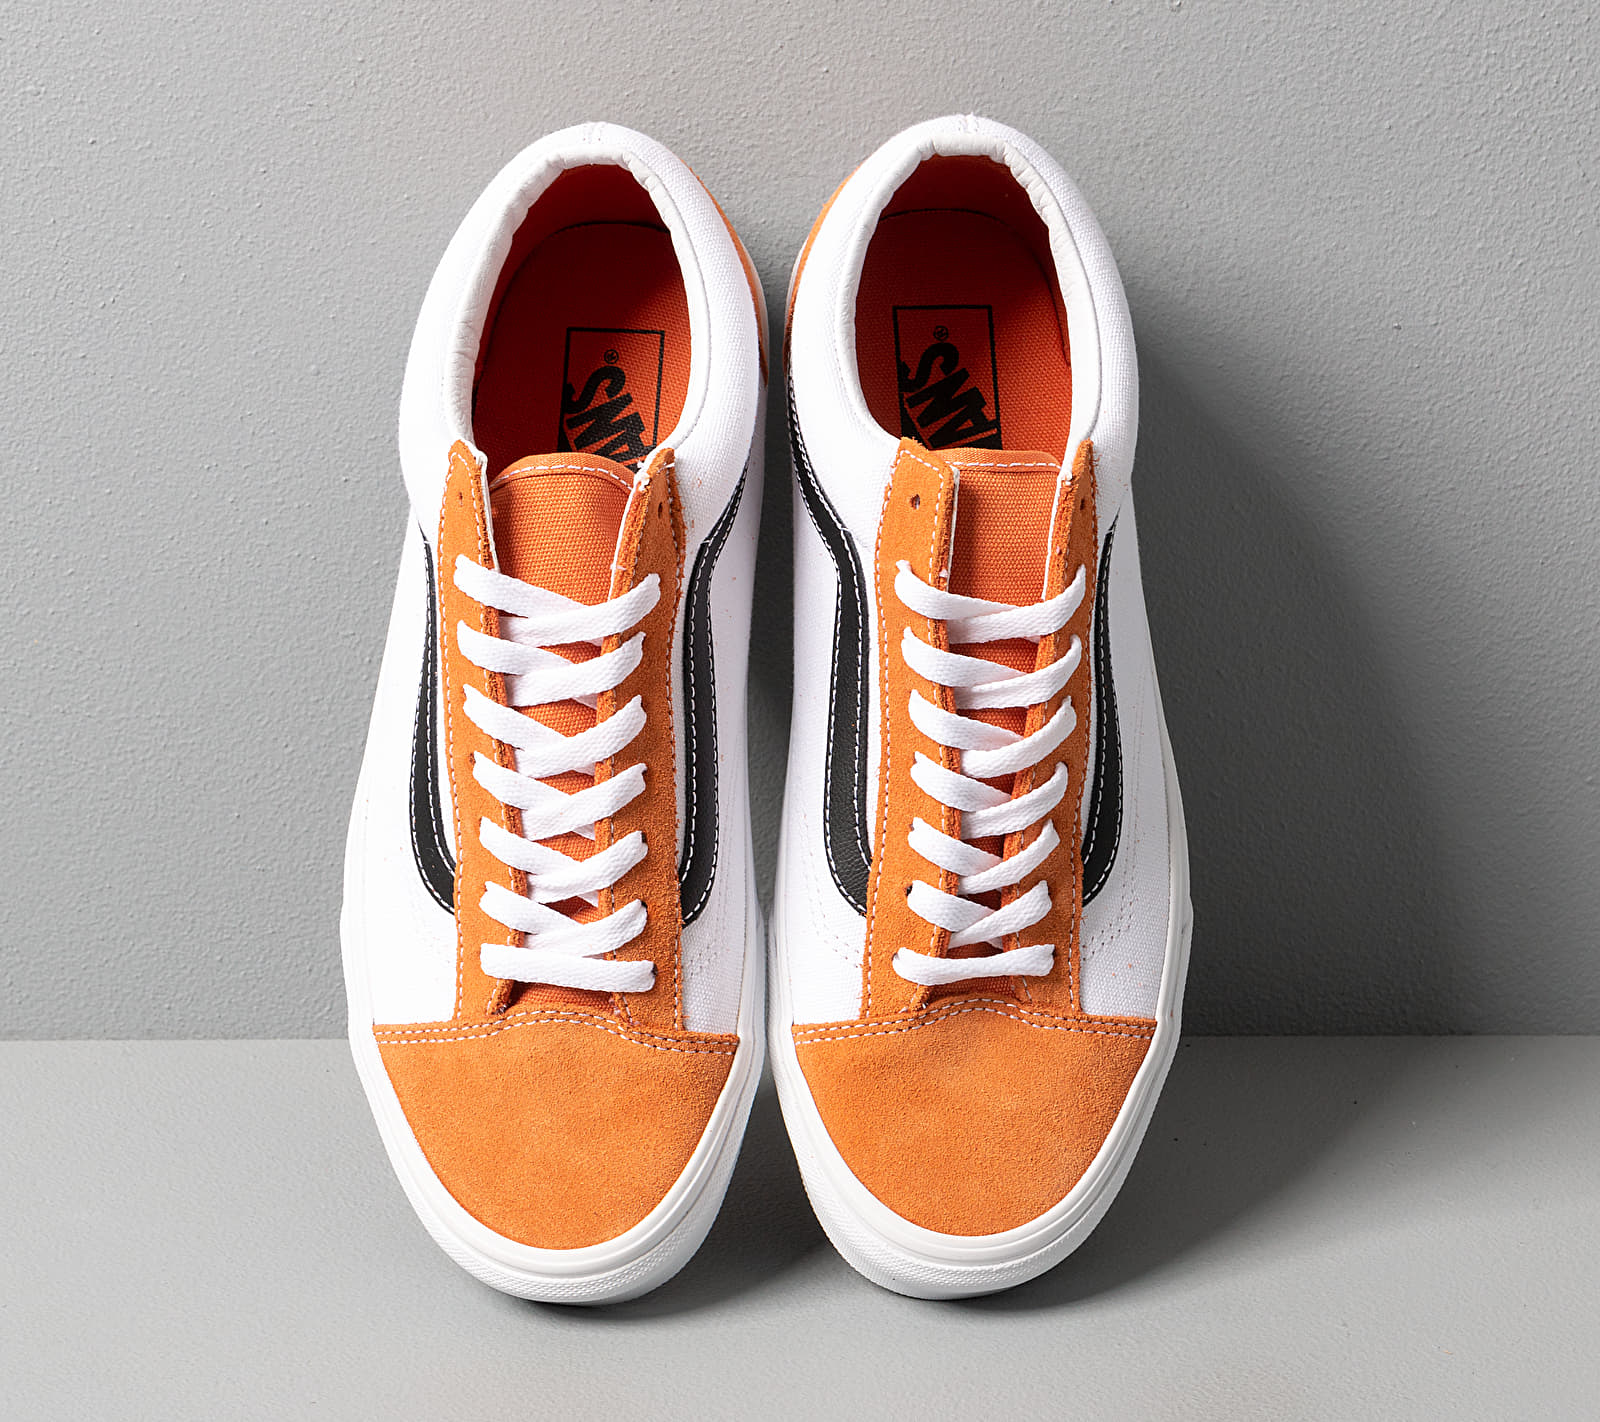 Vans Style 36 (Retro Sport) Apricot/ White, Multicolour